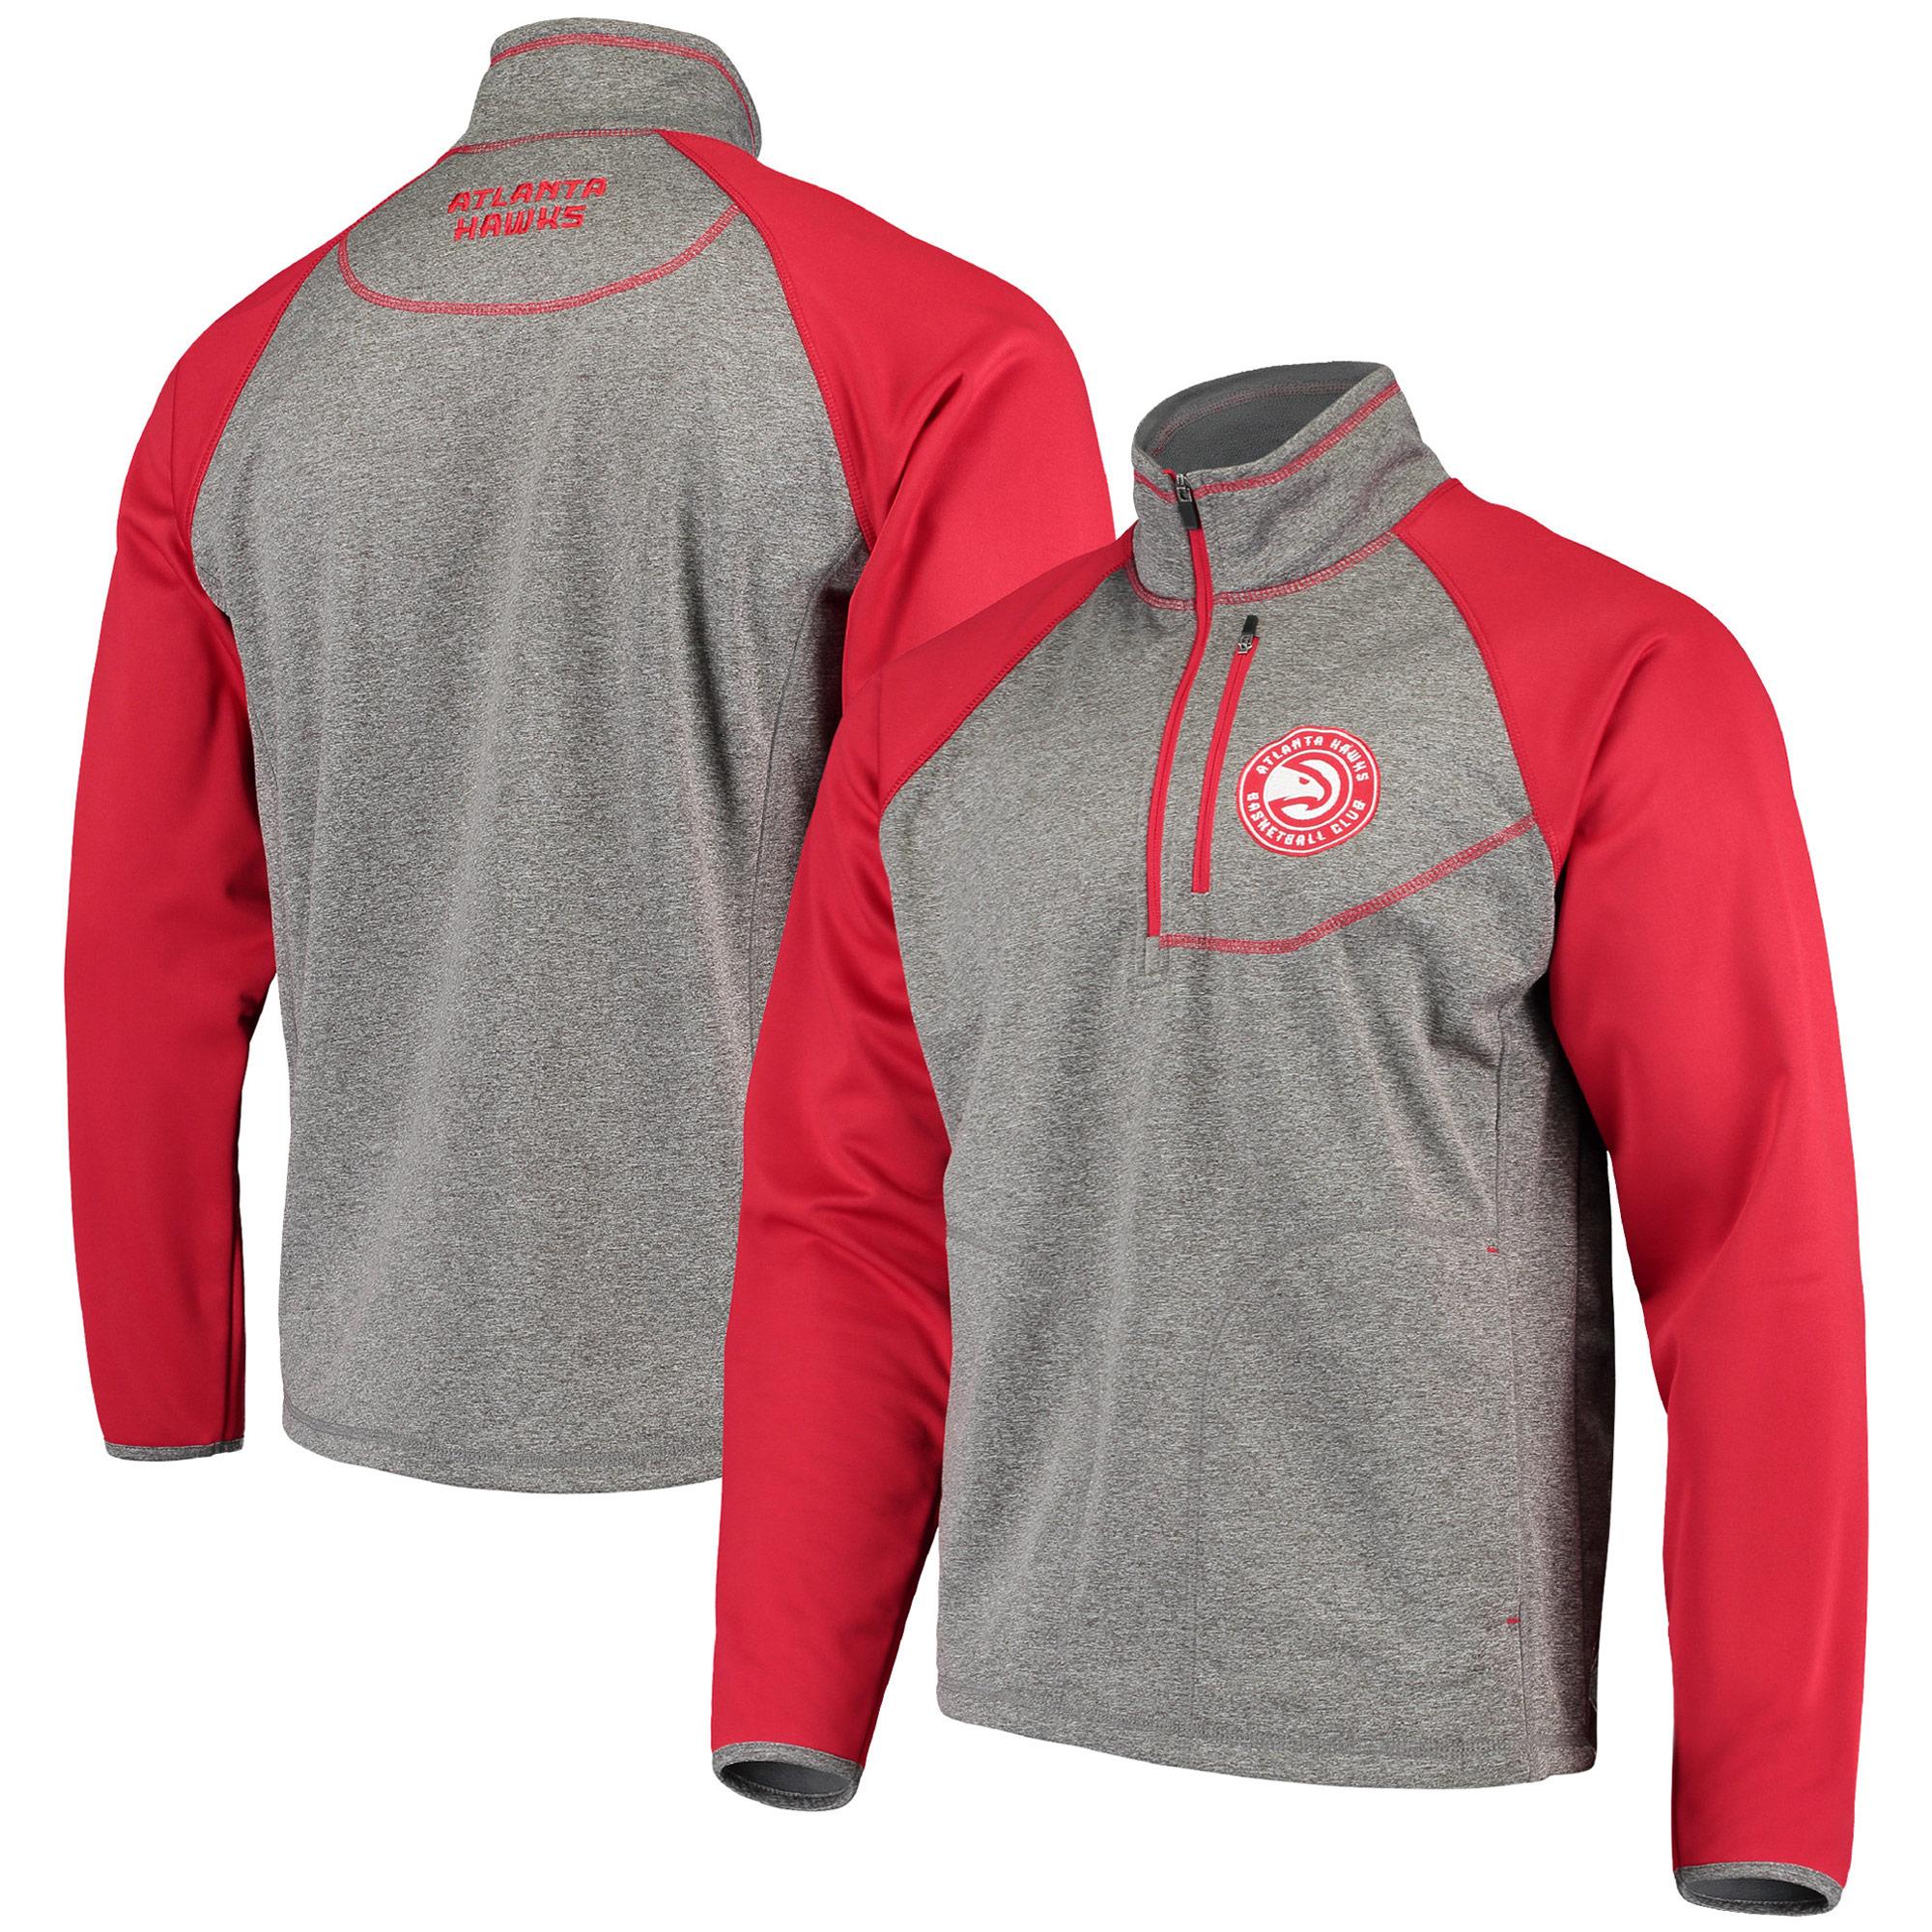 Atlanta Hawks G-III Sports by Carl Banks Mountain Trail Half-Zip Pullover Jacket - Gray/Red